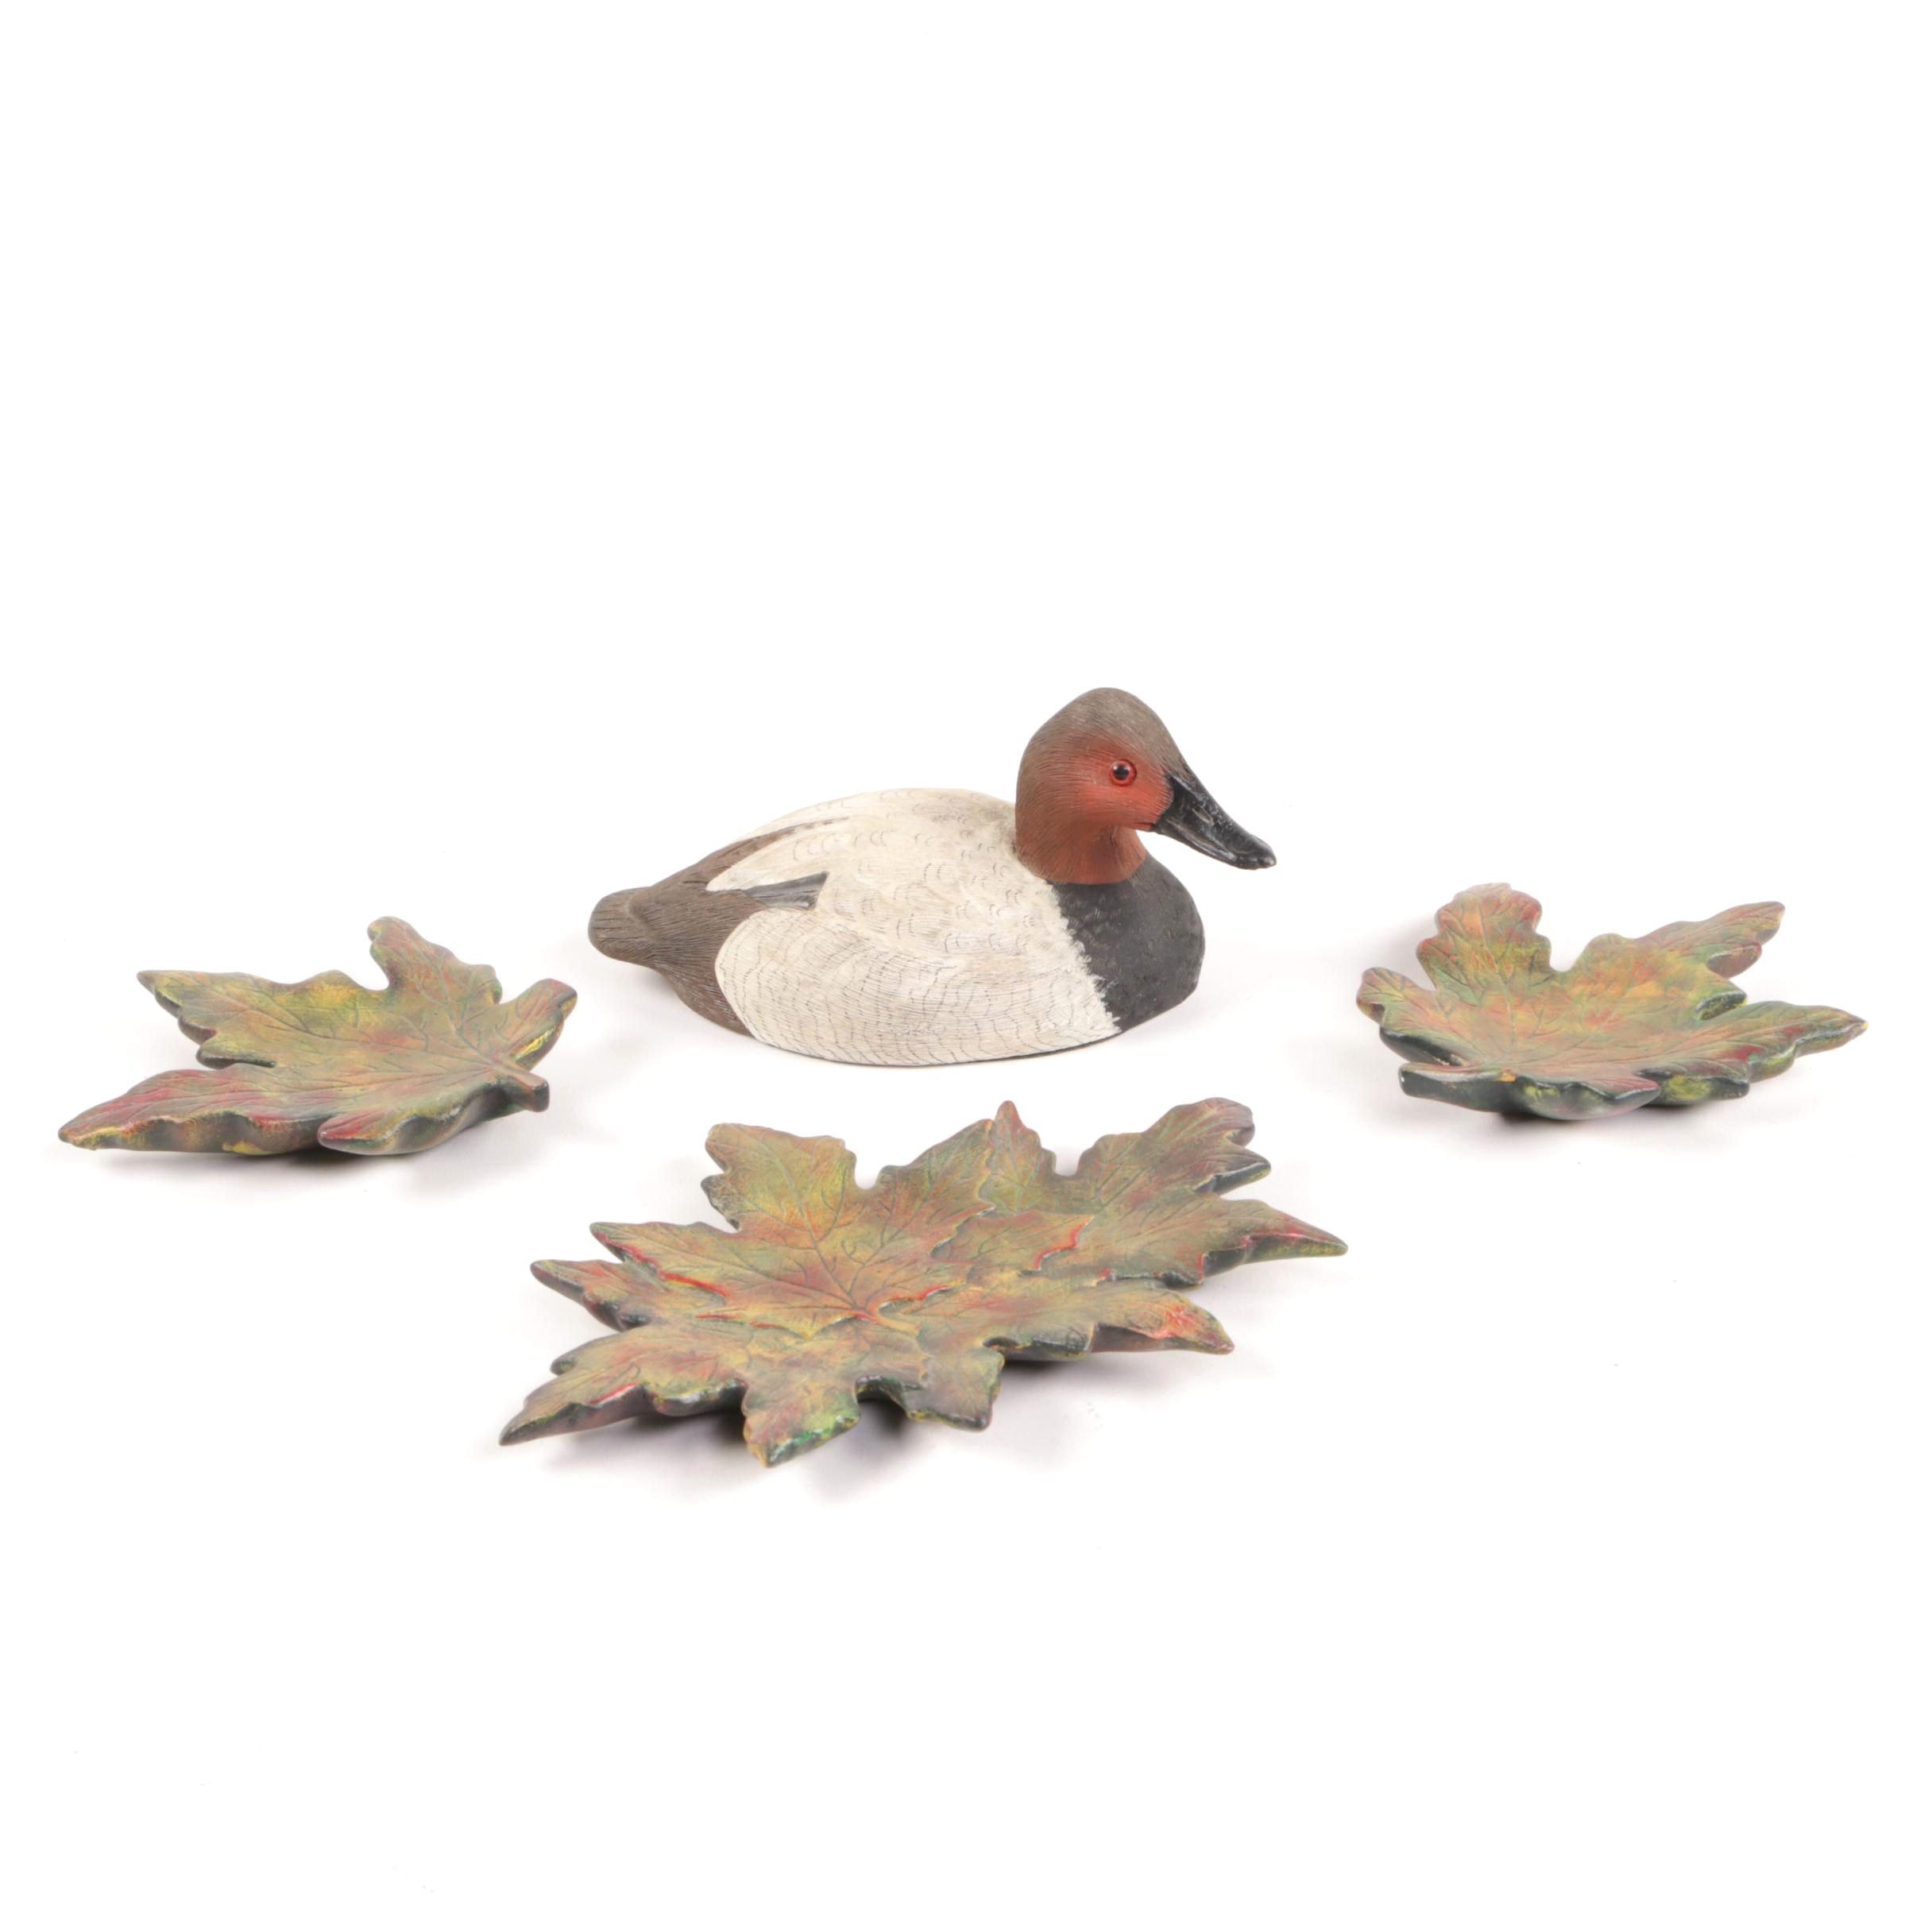 Ceramic Leaf and Duck Figurines